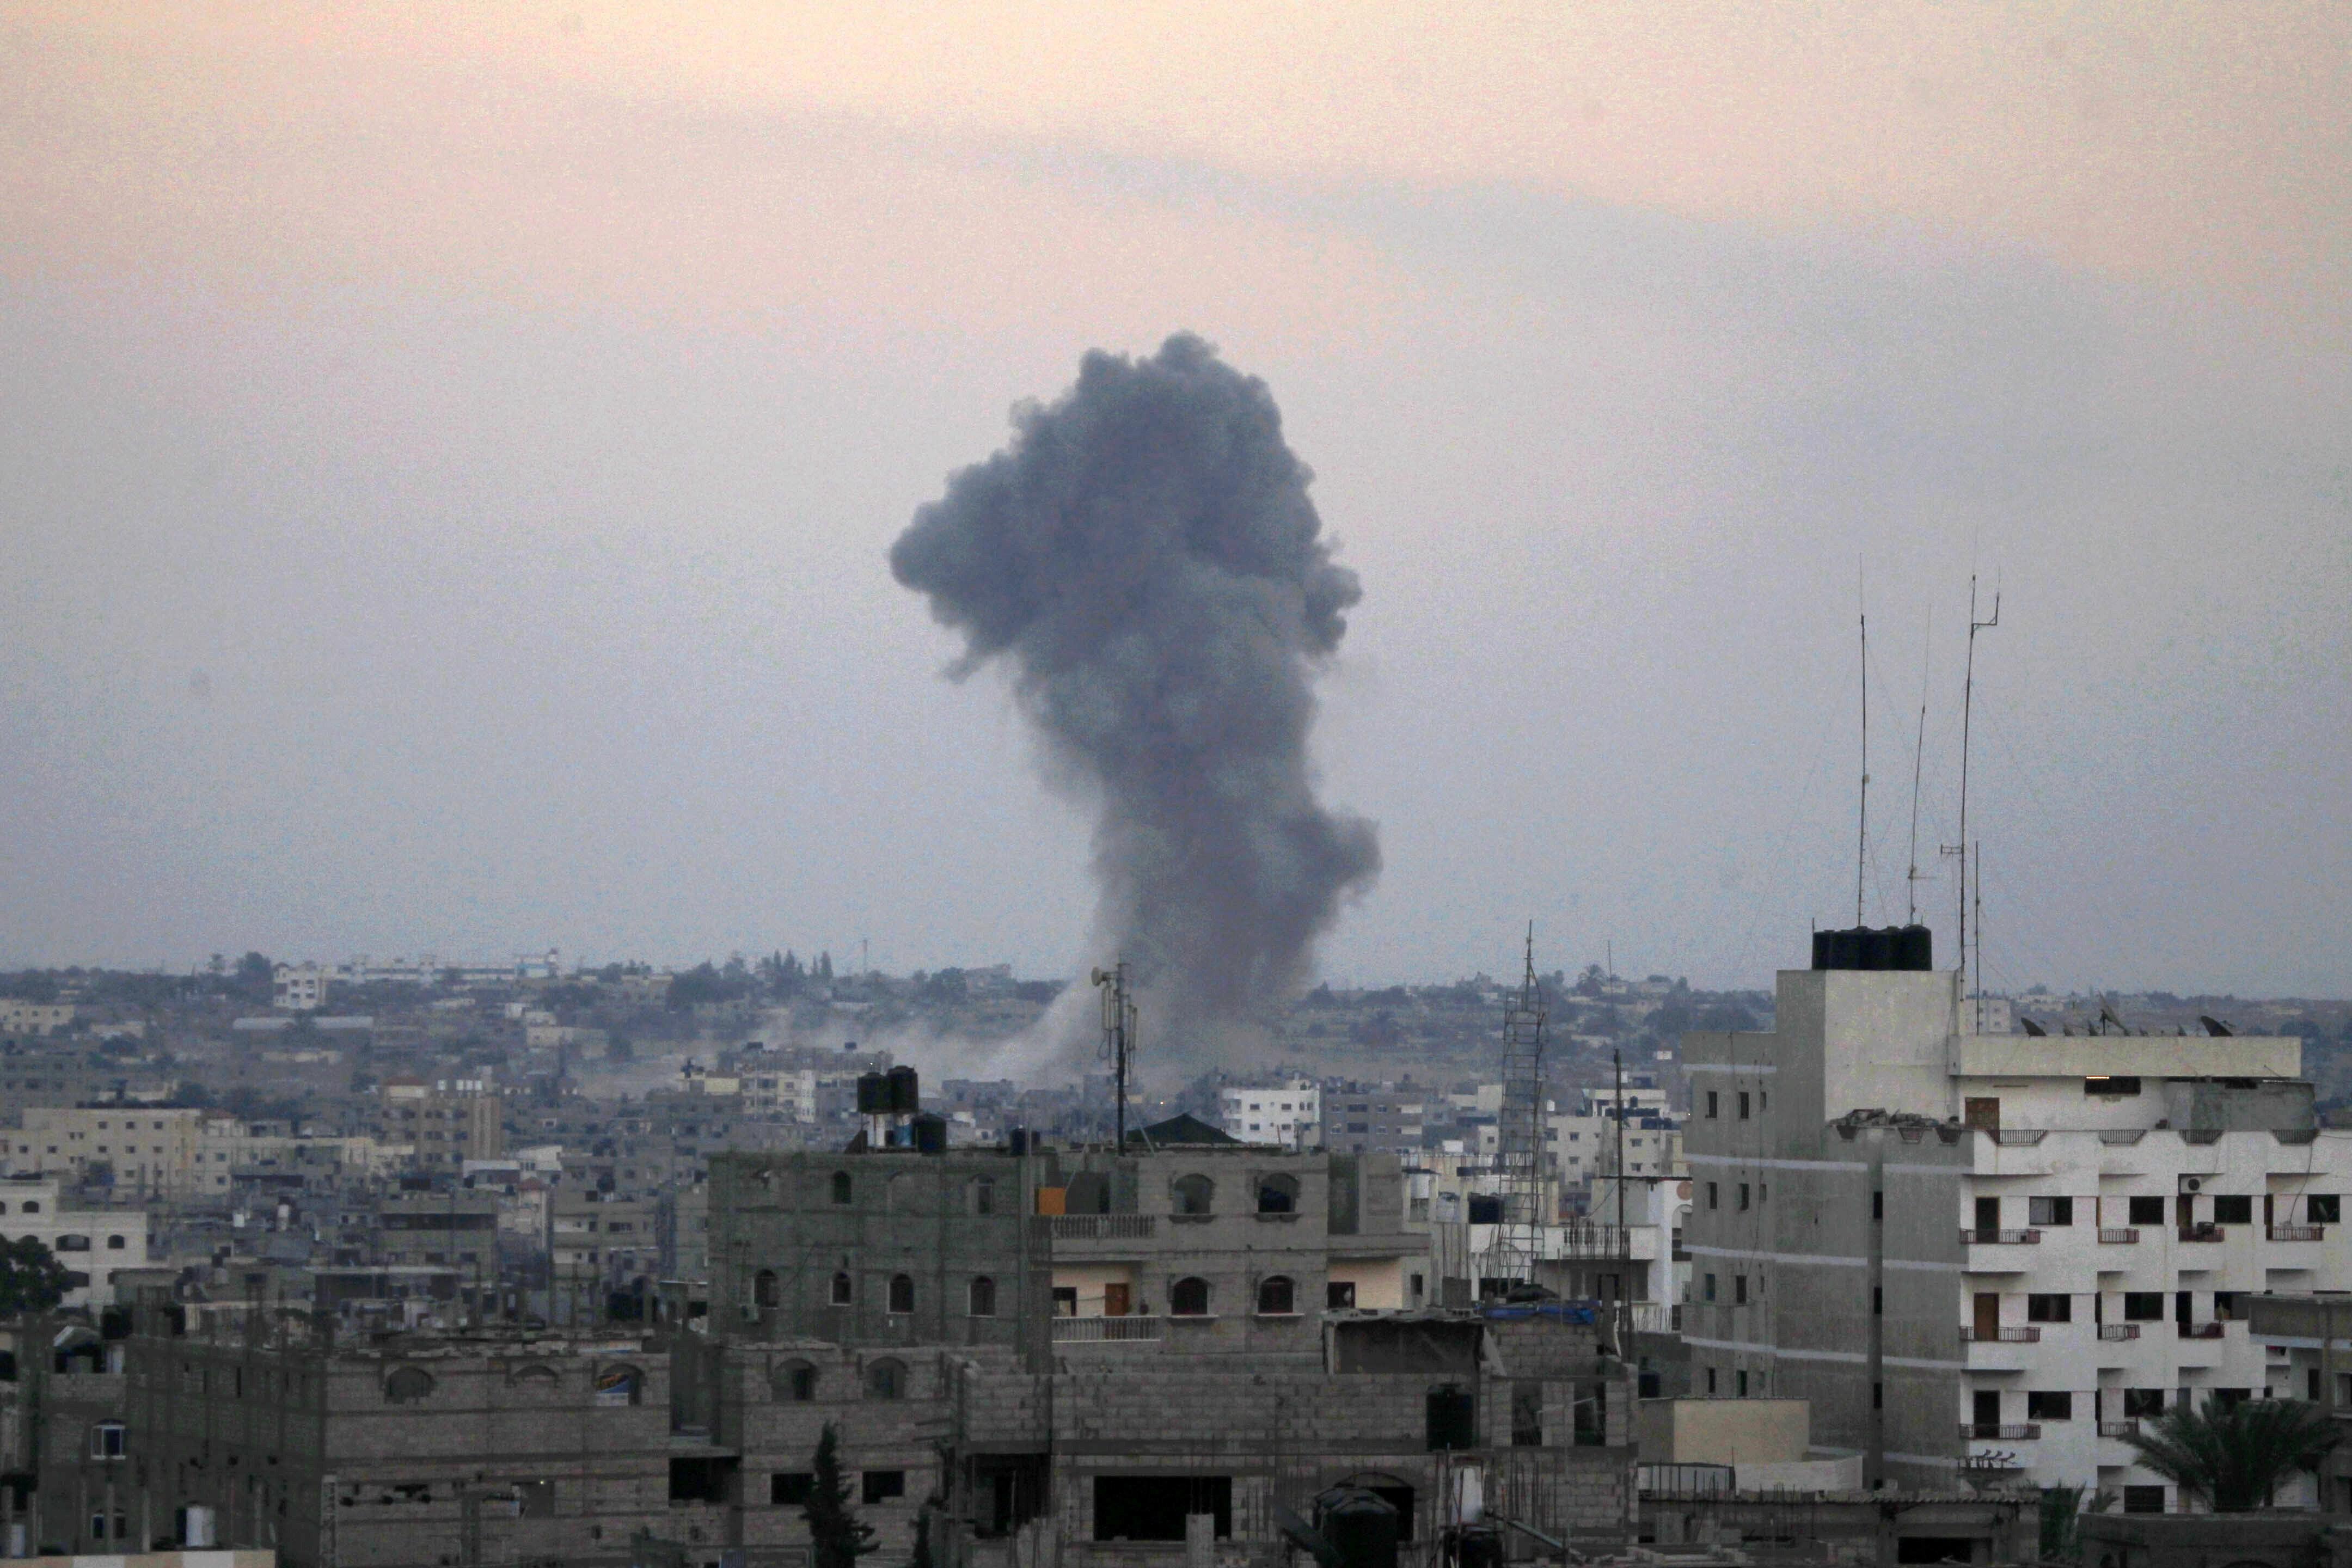 Washington Post: Cum arata un atac aerian asupra unei cladiri din Gaza. O bomba a fost surprinsa in cadere de un fotograf